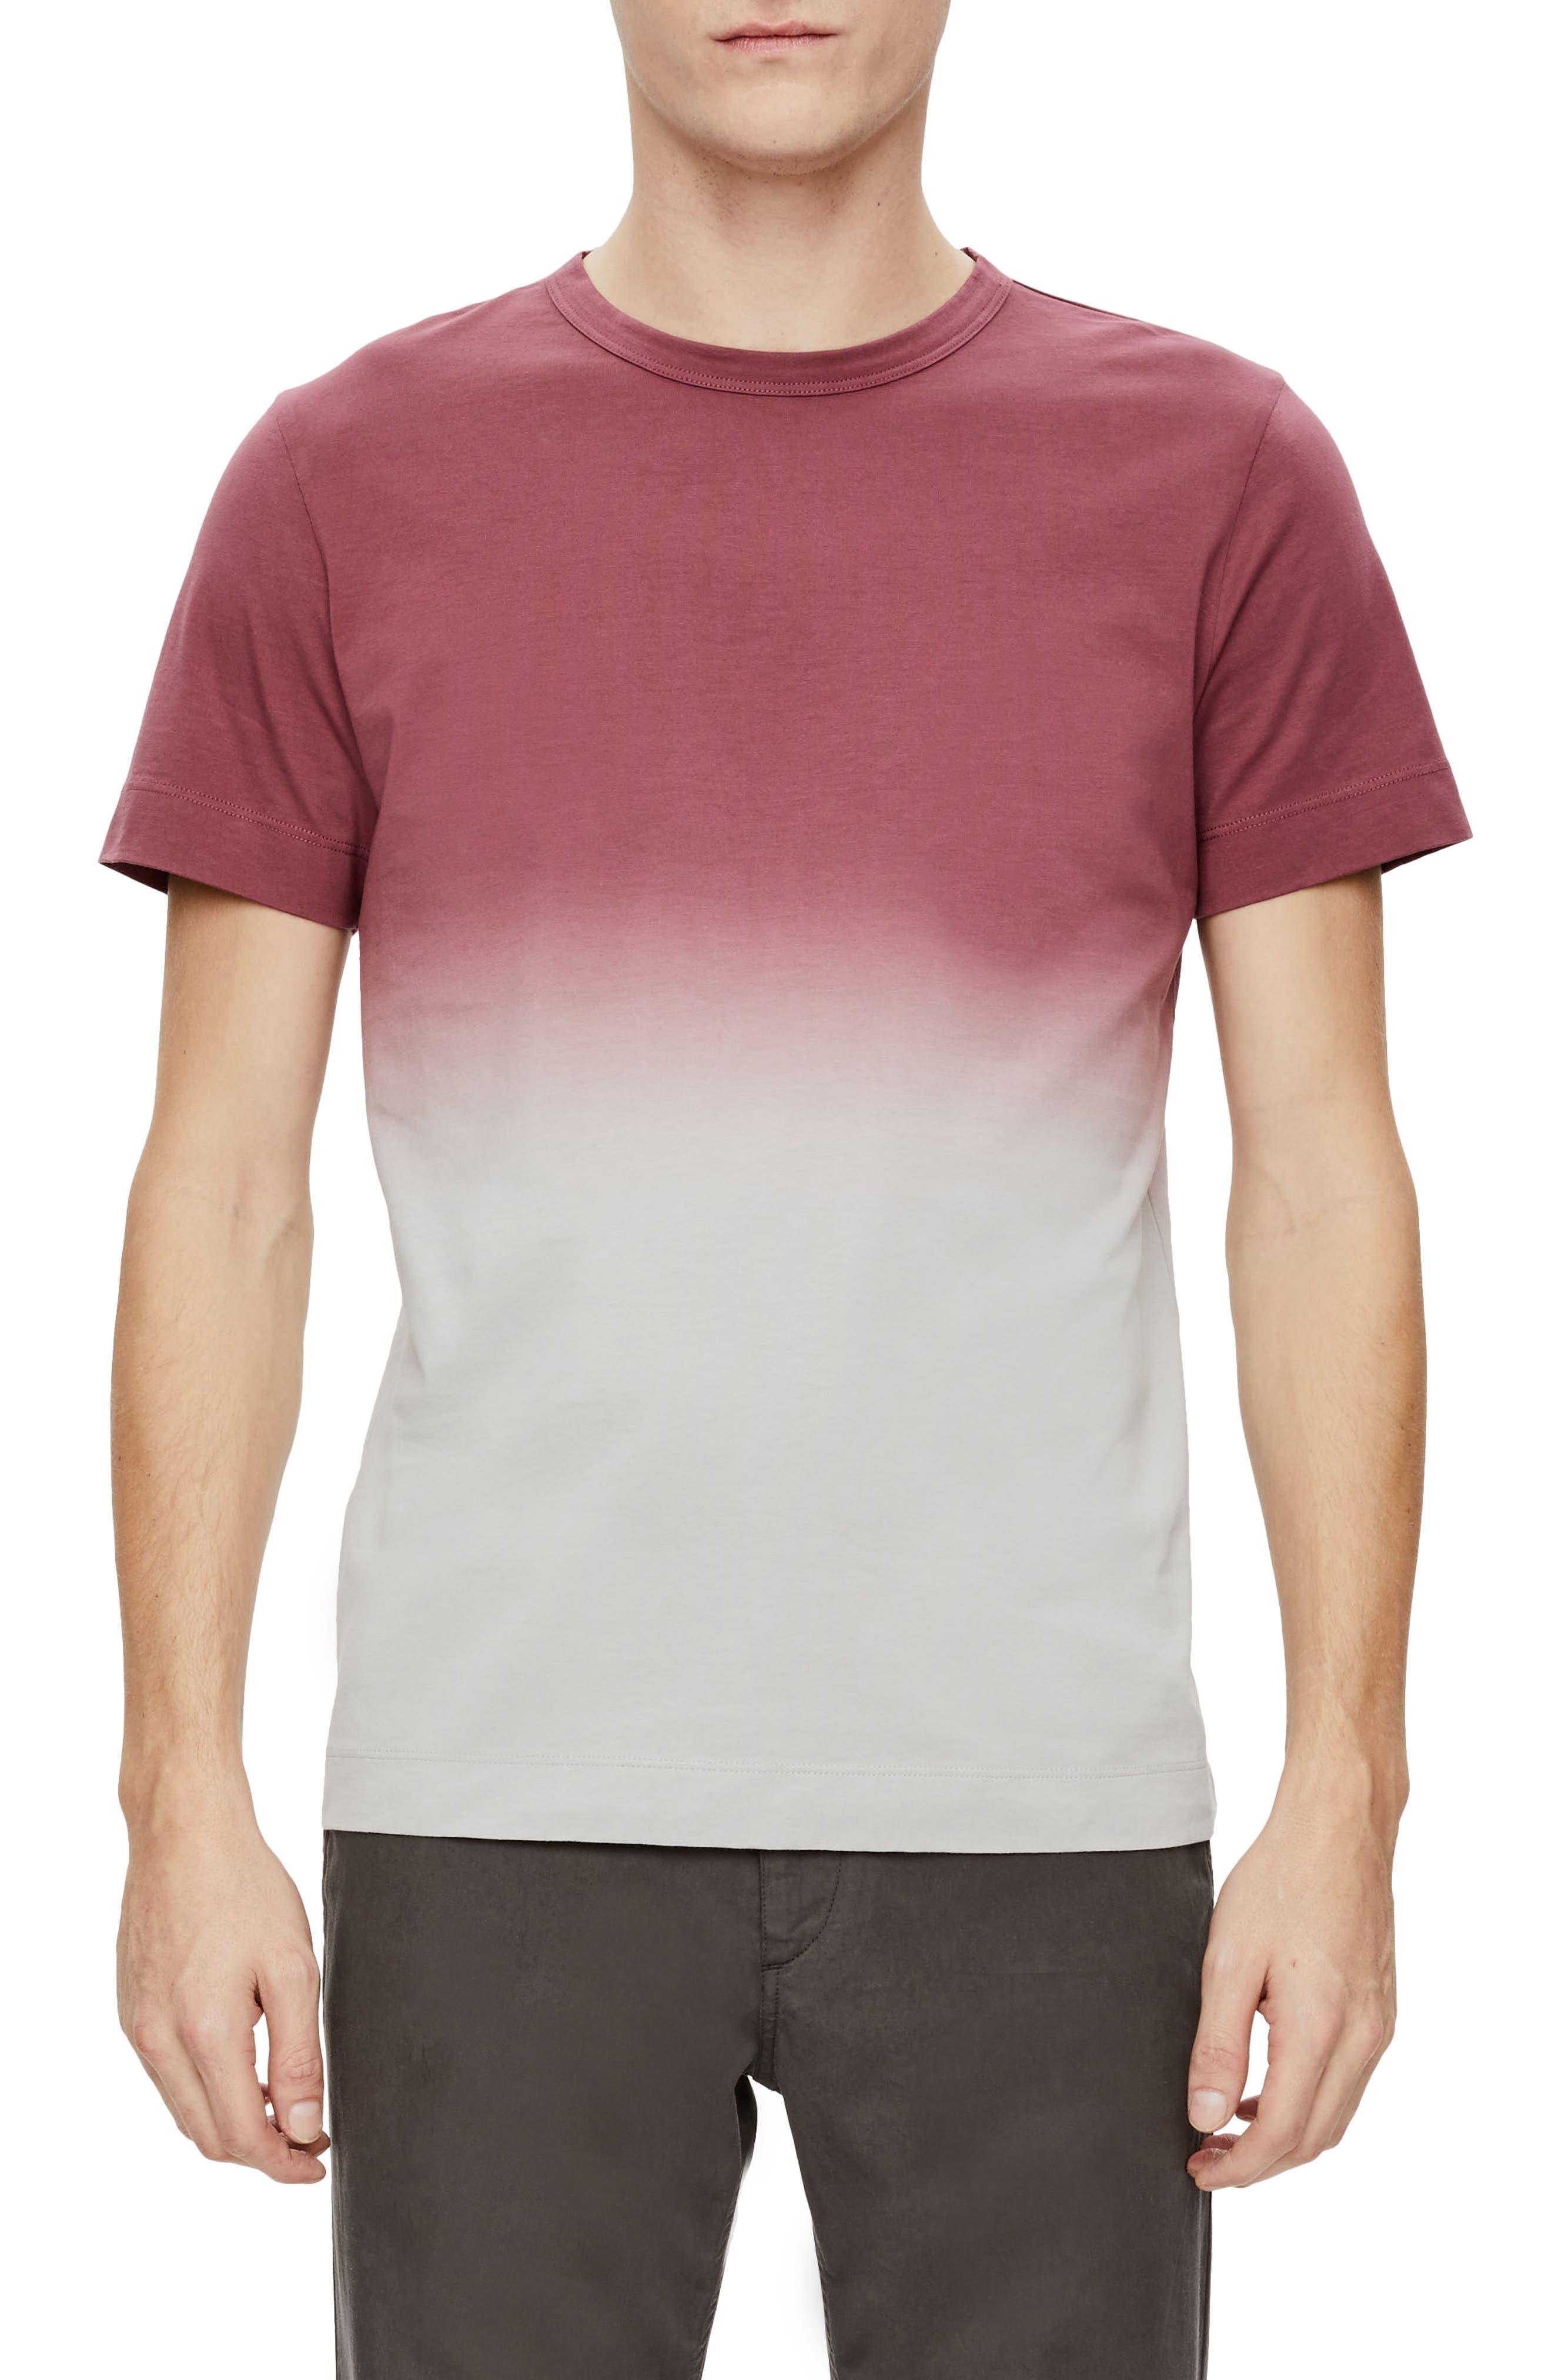 Theory Gaskell Dip Dye Ombré T-Shirt